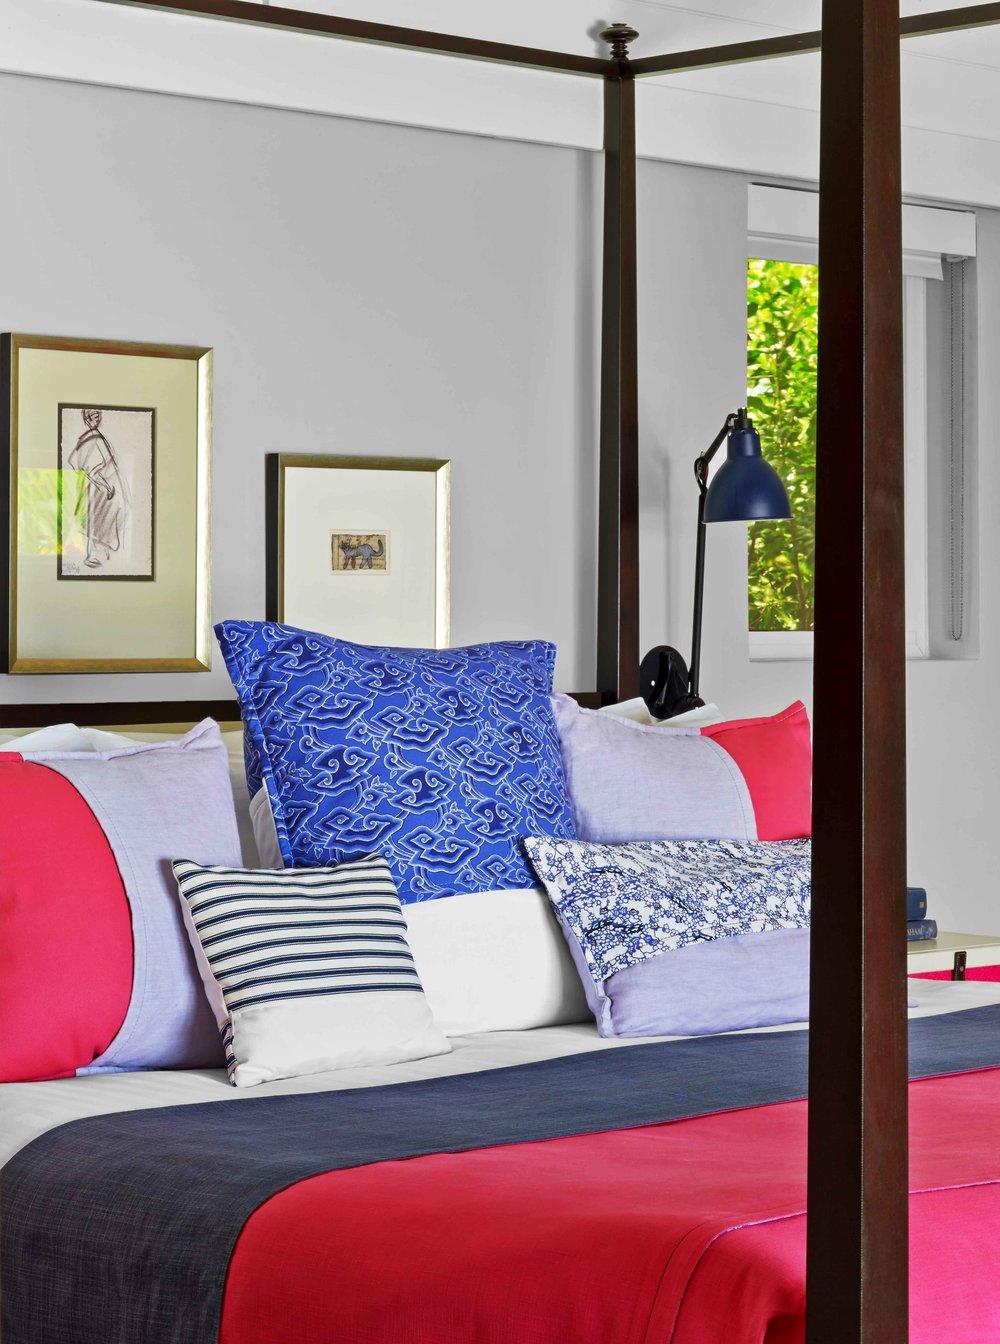 luis-pons-design-interior-tropical-hotel-stbarths_18.jpg